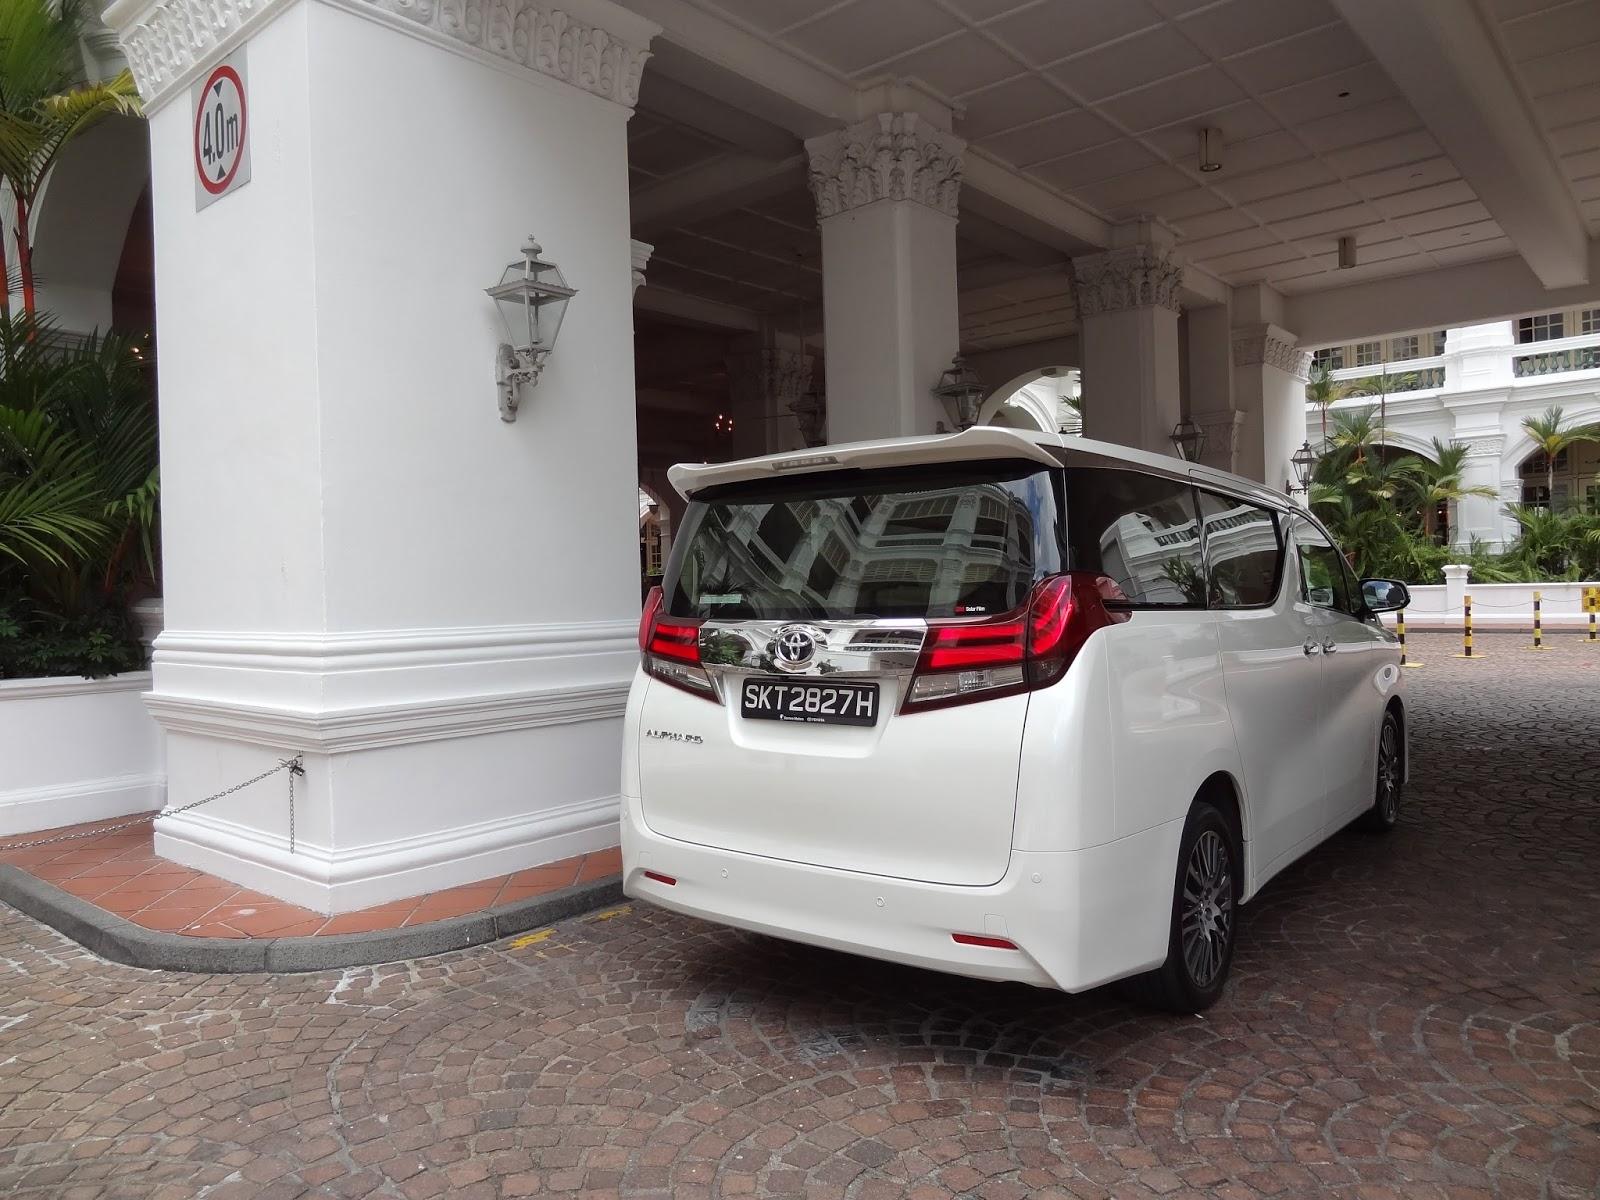 Shaun Owyeong: Toyota Alphard 2 5 Elegance [Car Review]